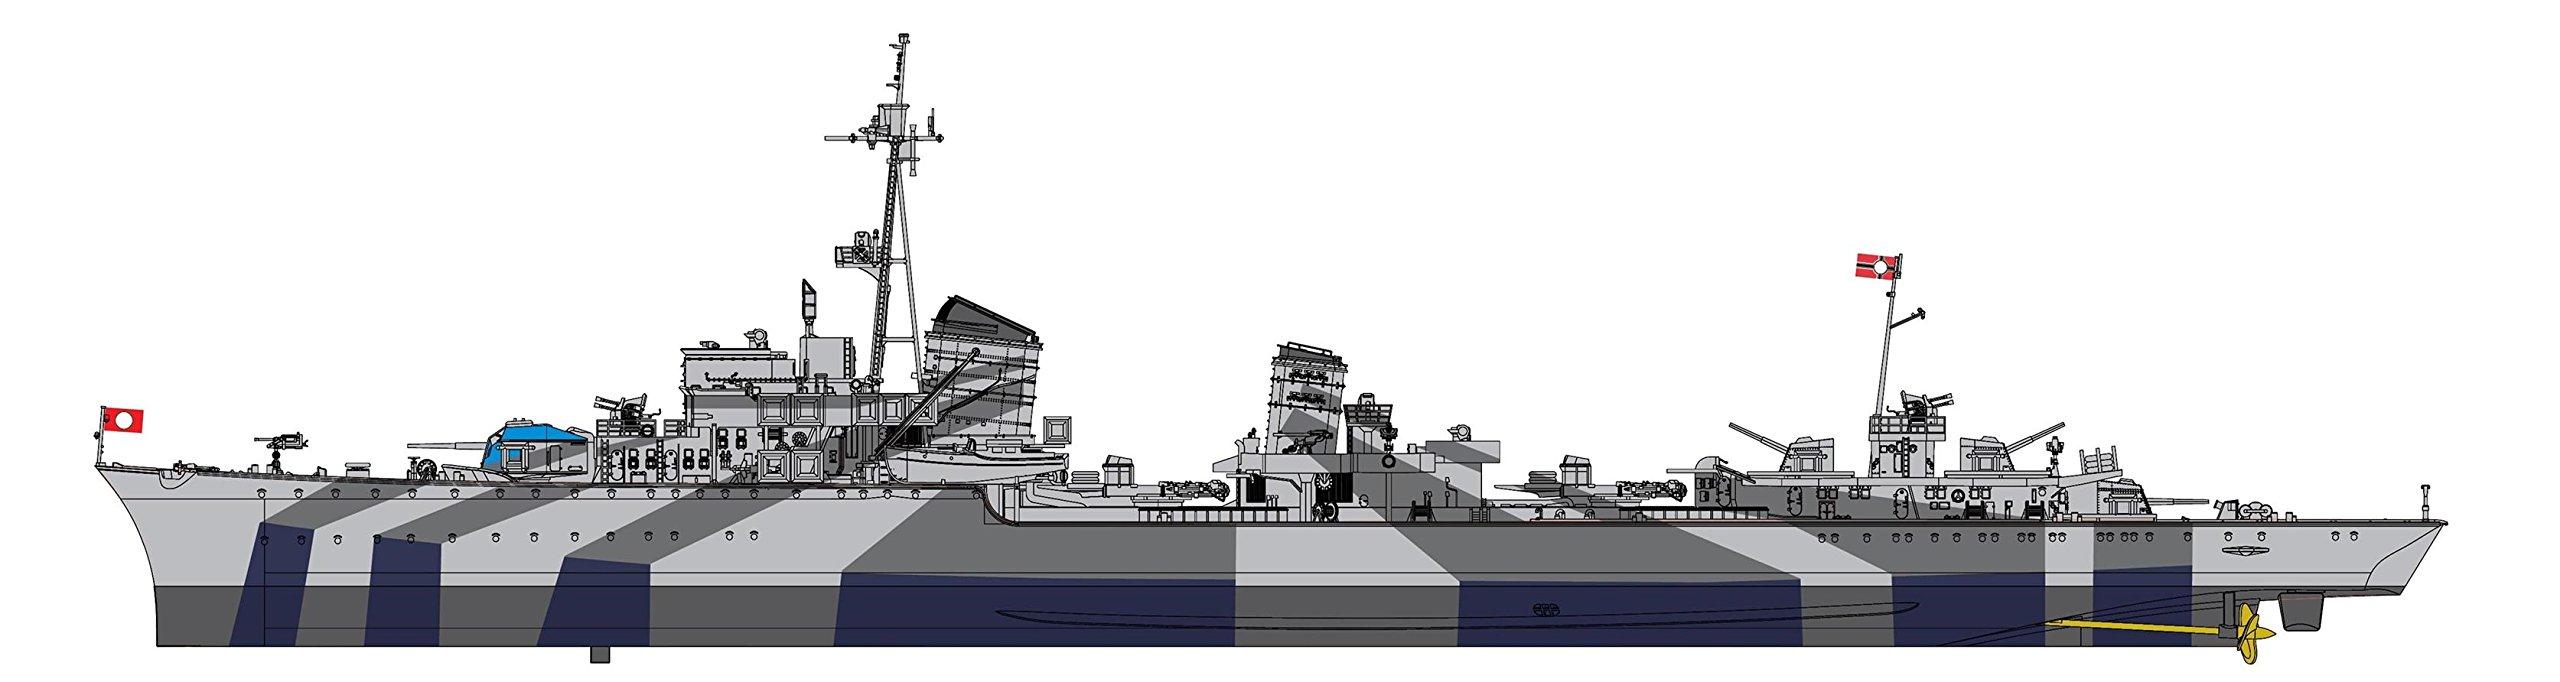 Dragon Models German Z-32 Destroyer Model Kit (1/350 Scale)